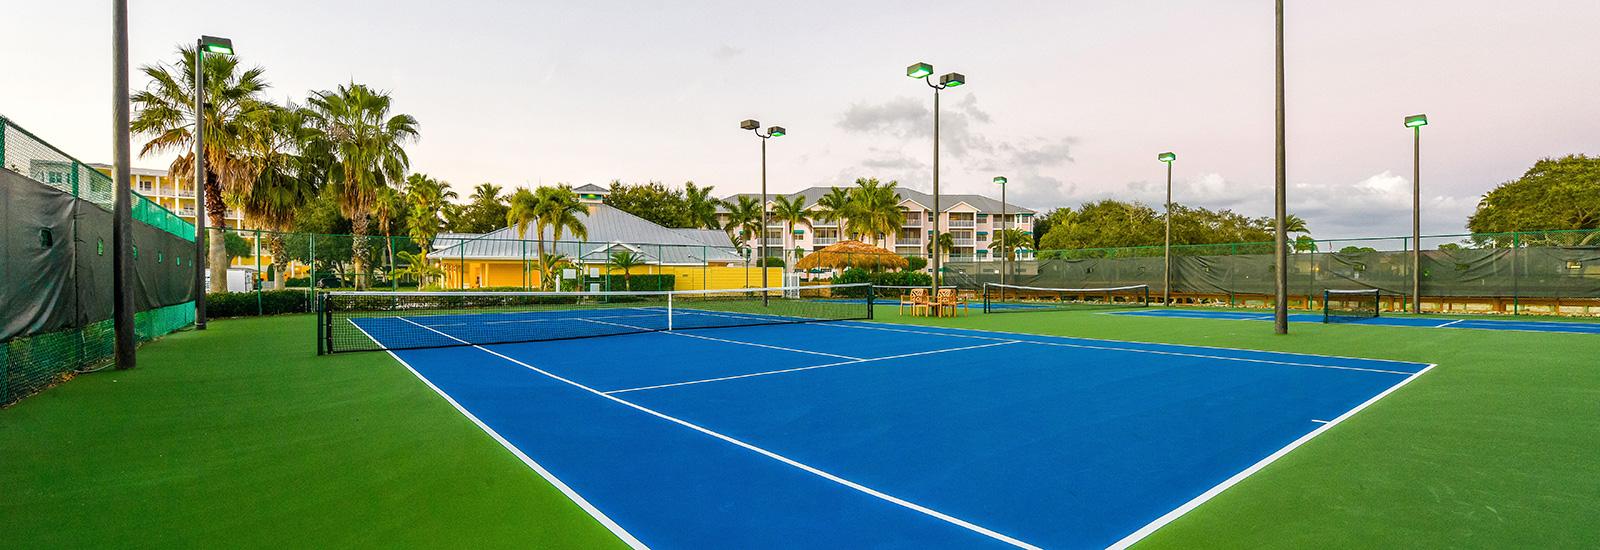 EdgewaterHB-tennis.jpg